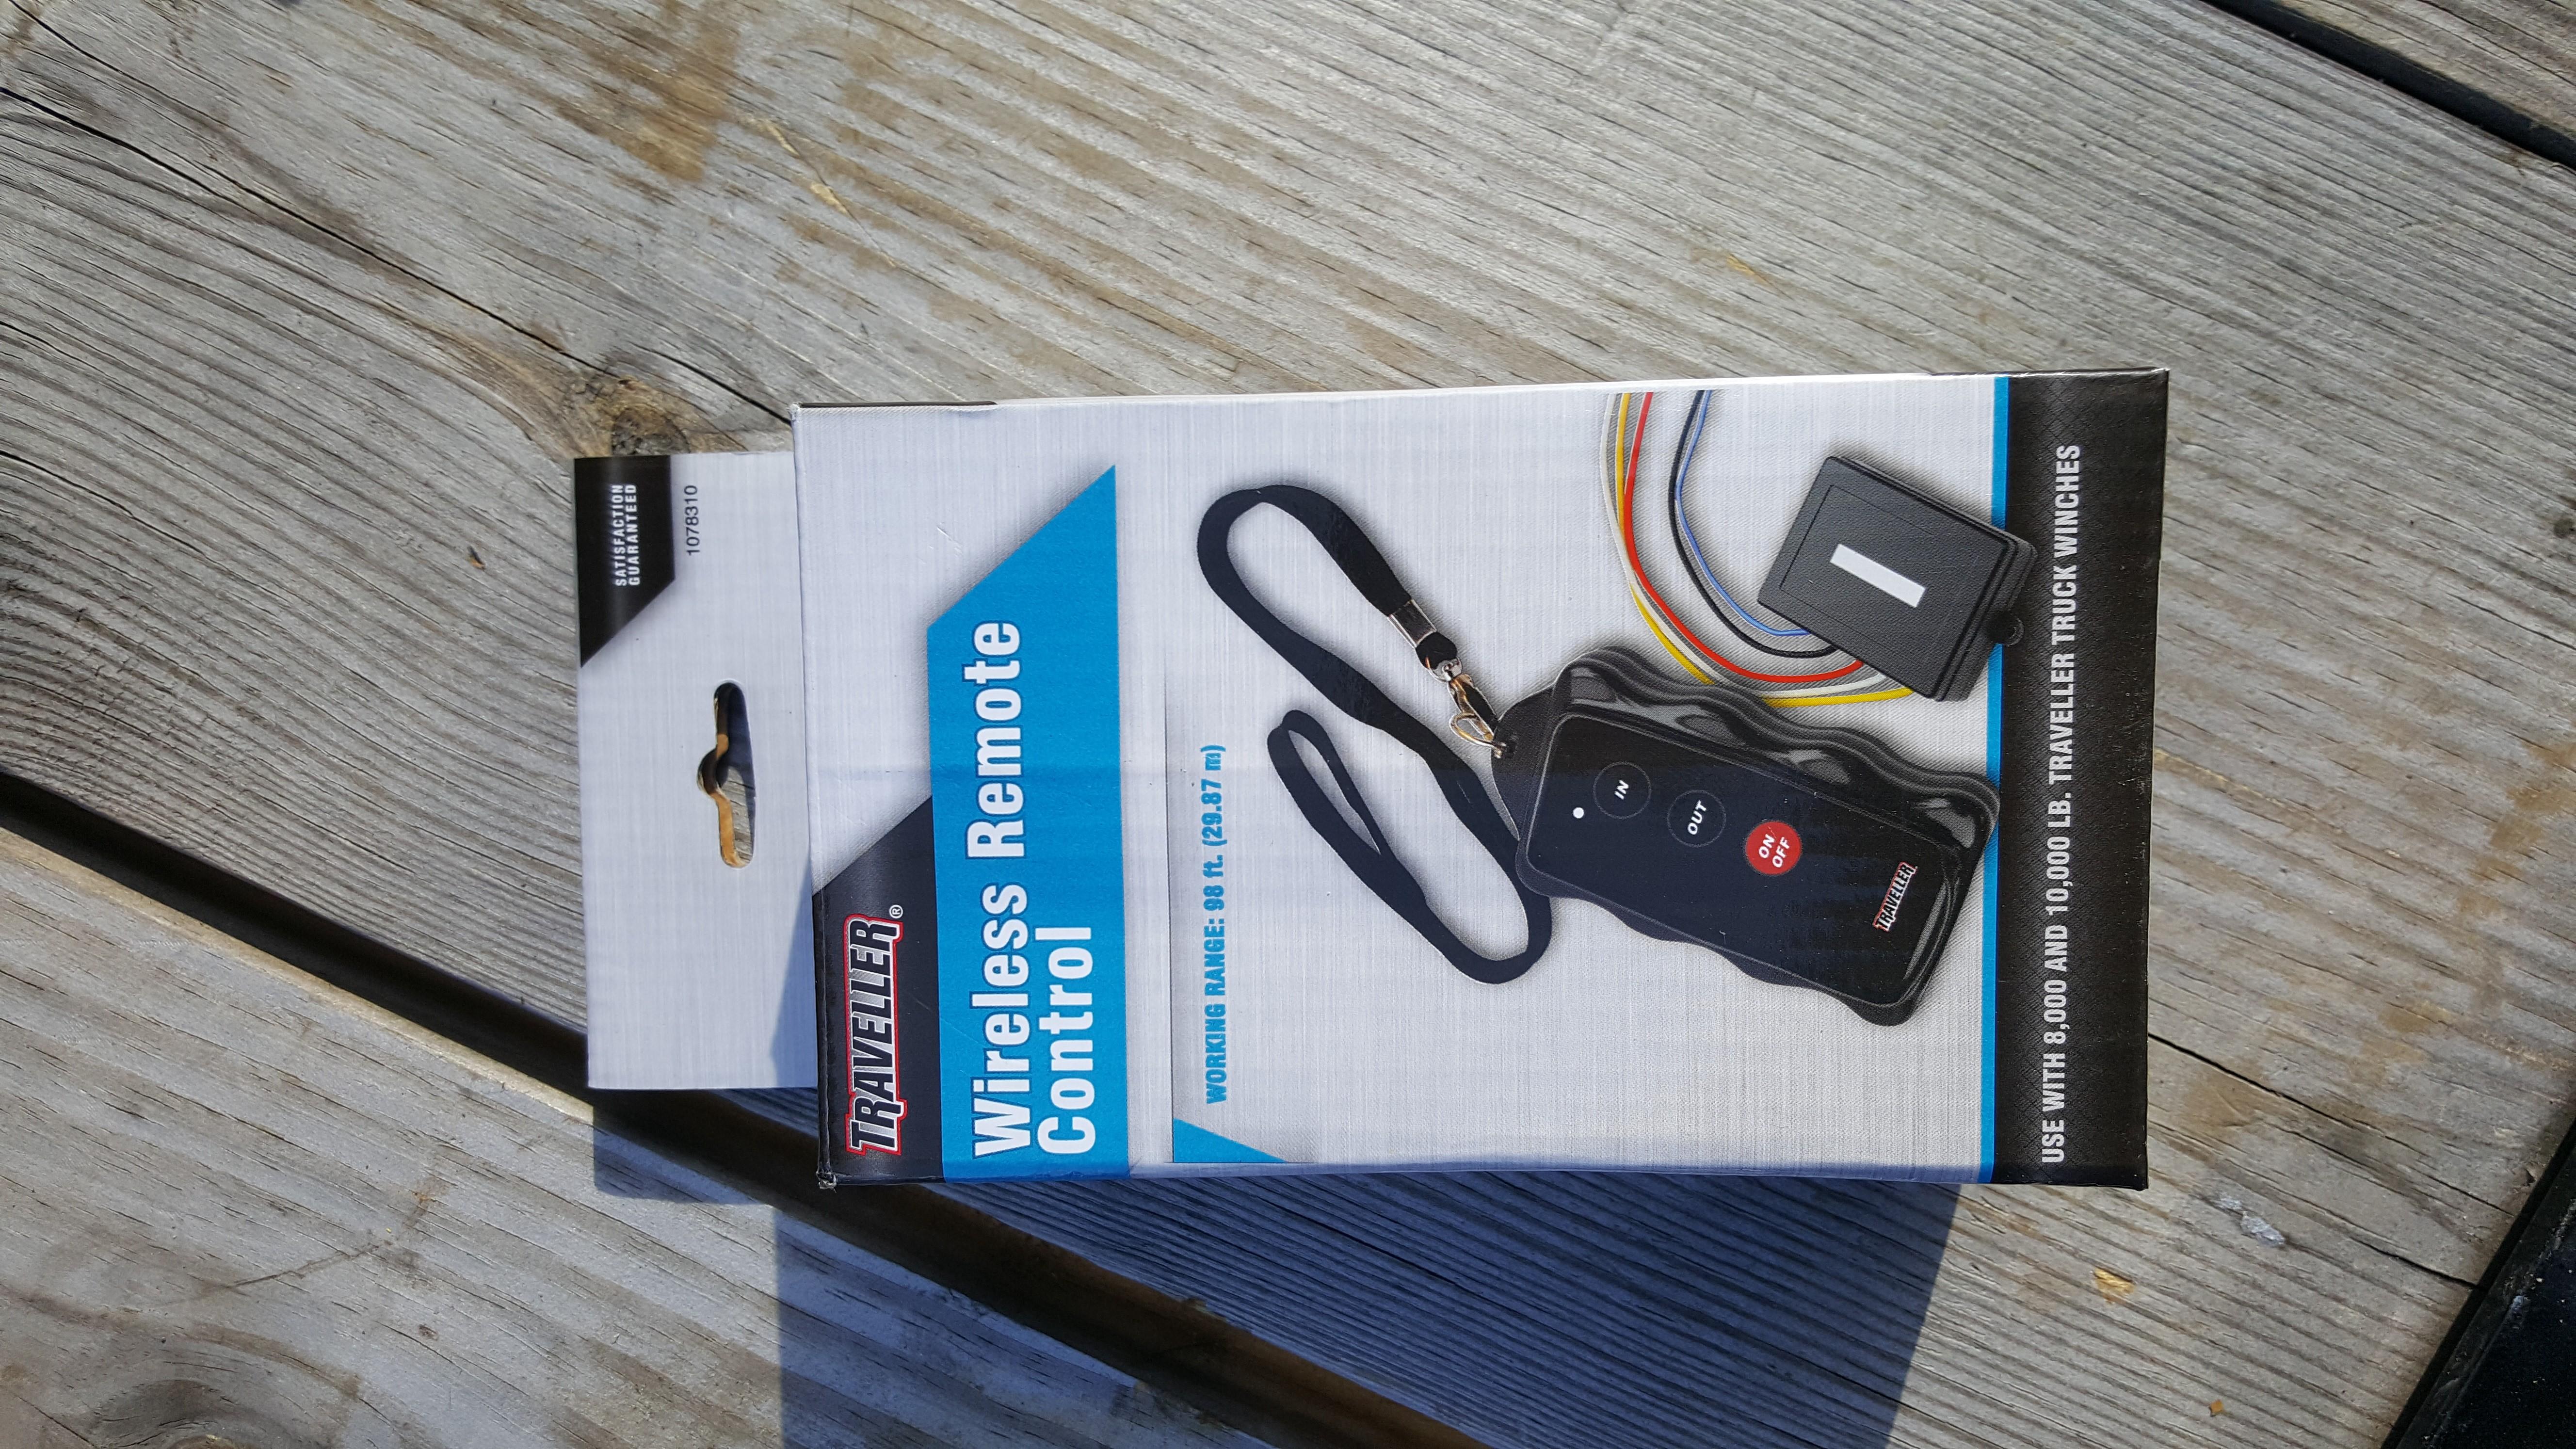 d wireless winch remote control yankee cheap